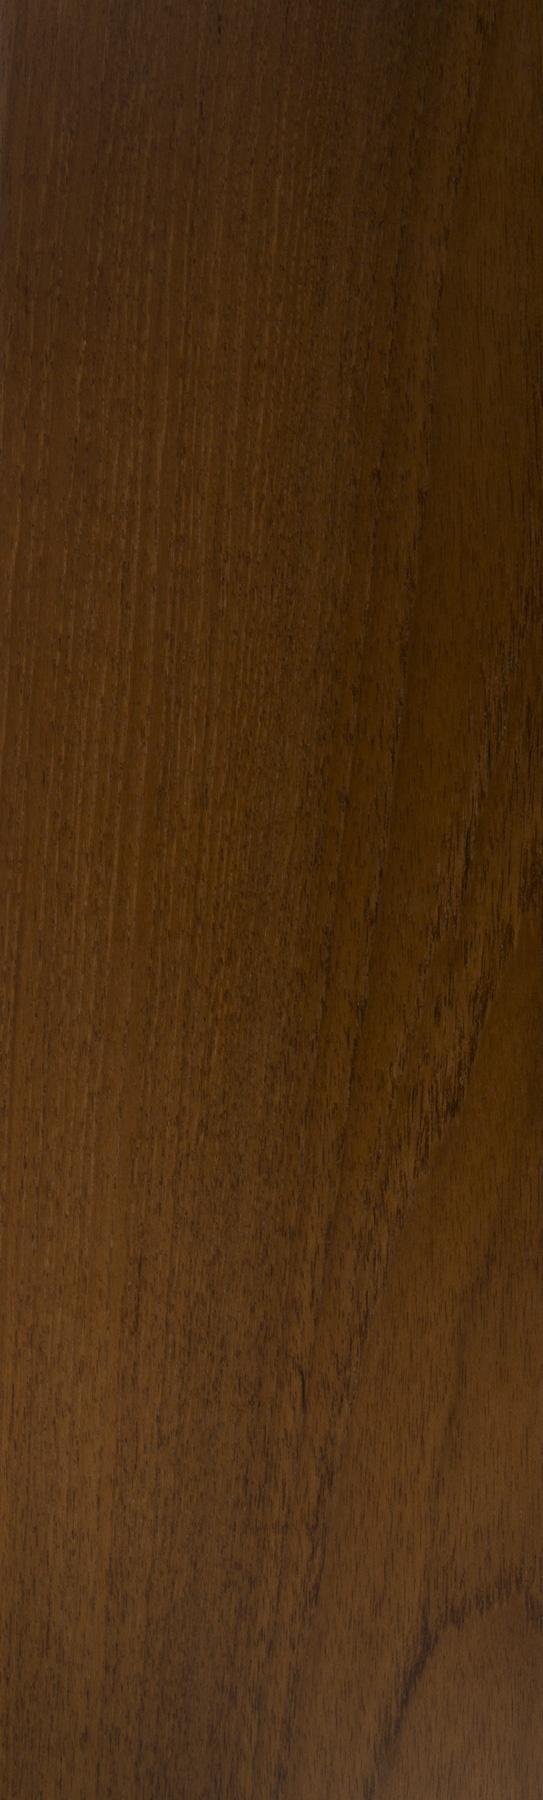 maderas-terramont-loft-mate-teak